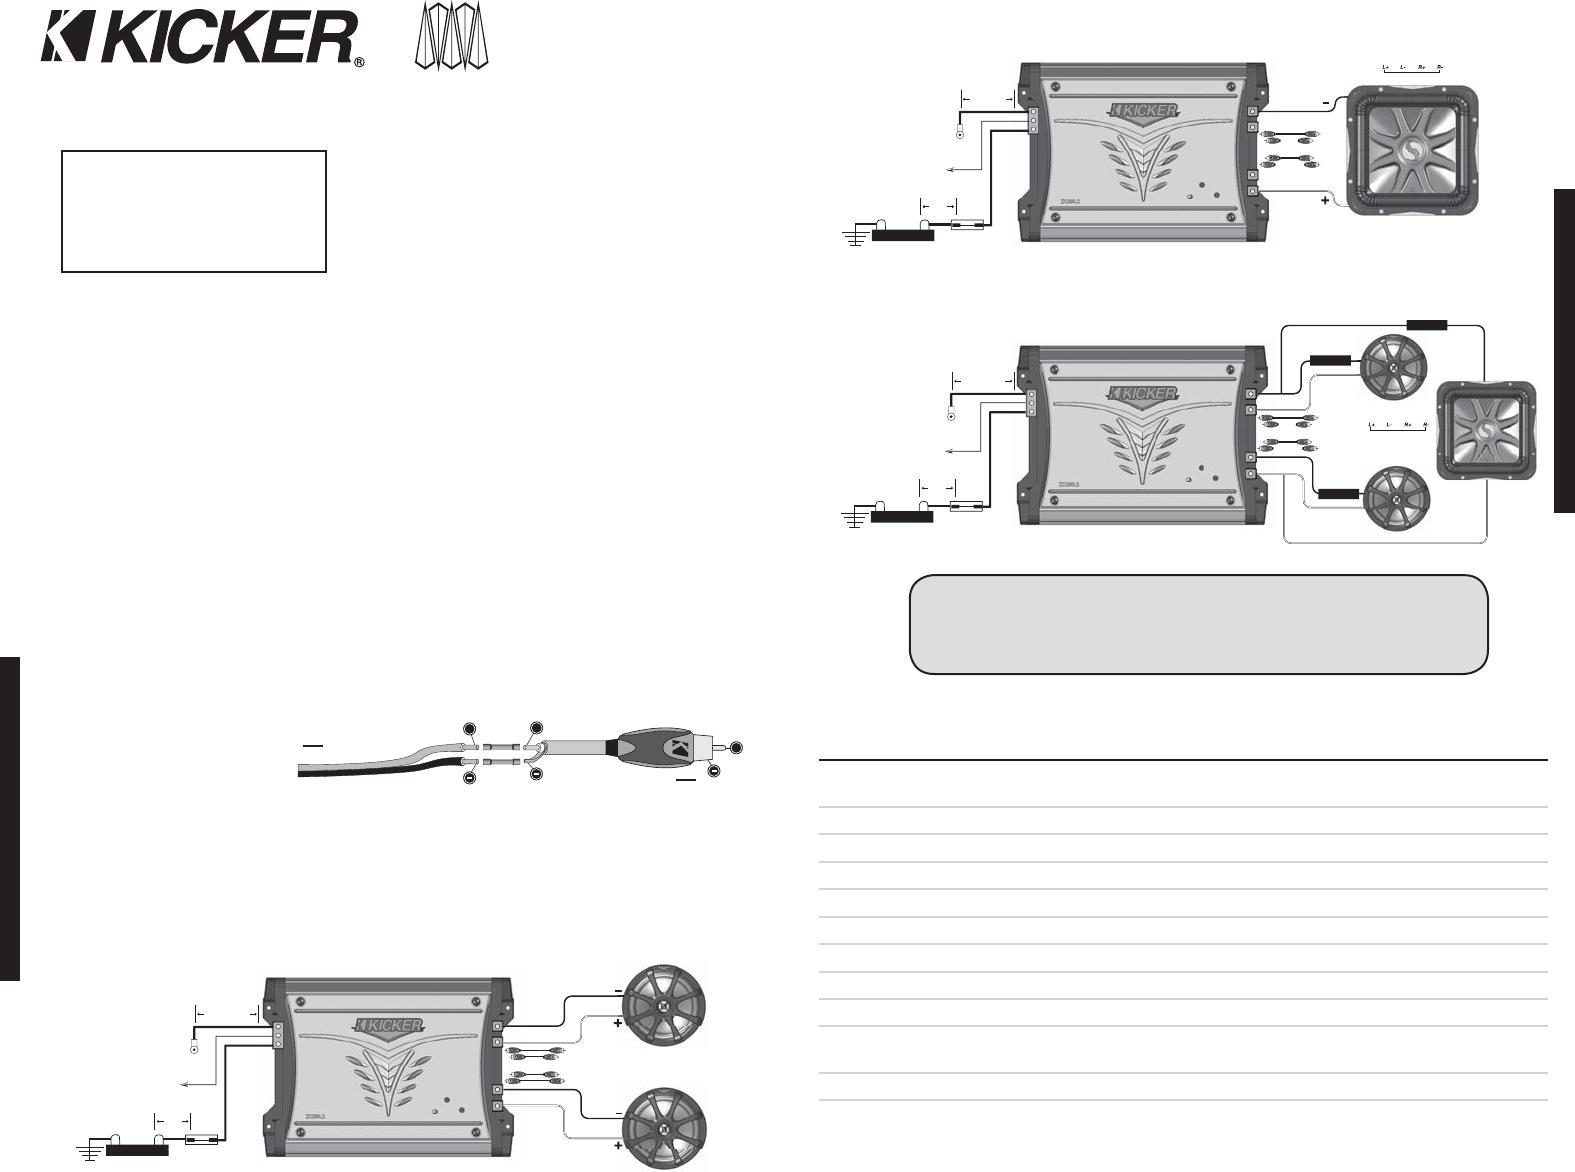 Kicker Comp R 12 Wiring Diagram from usermanual.wiki